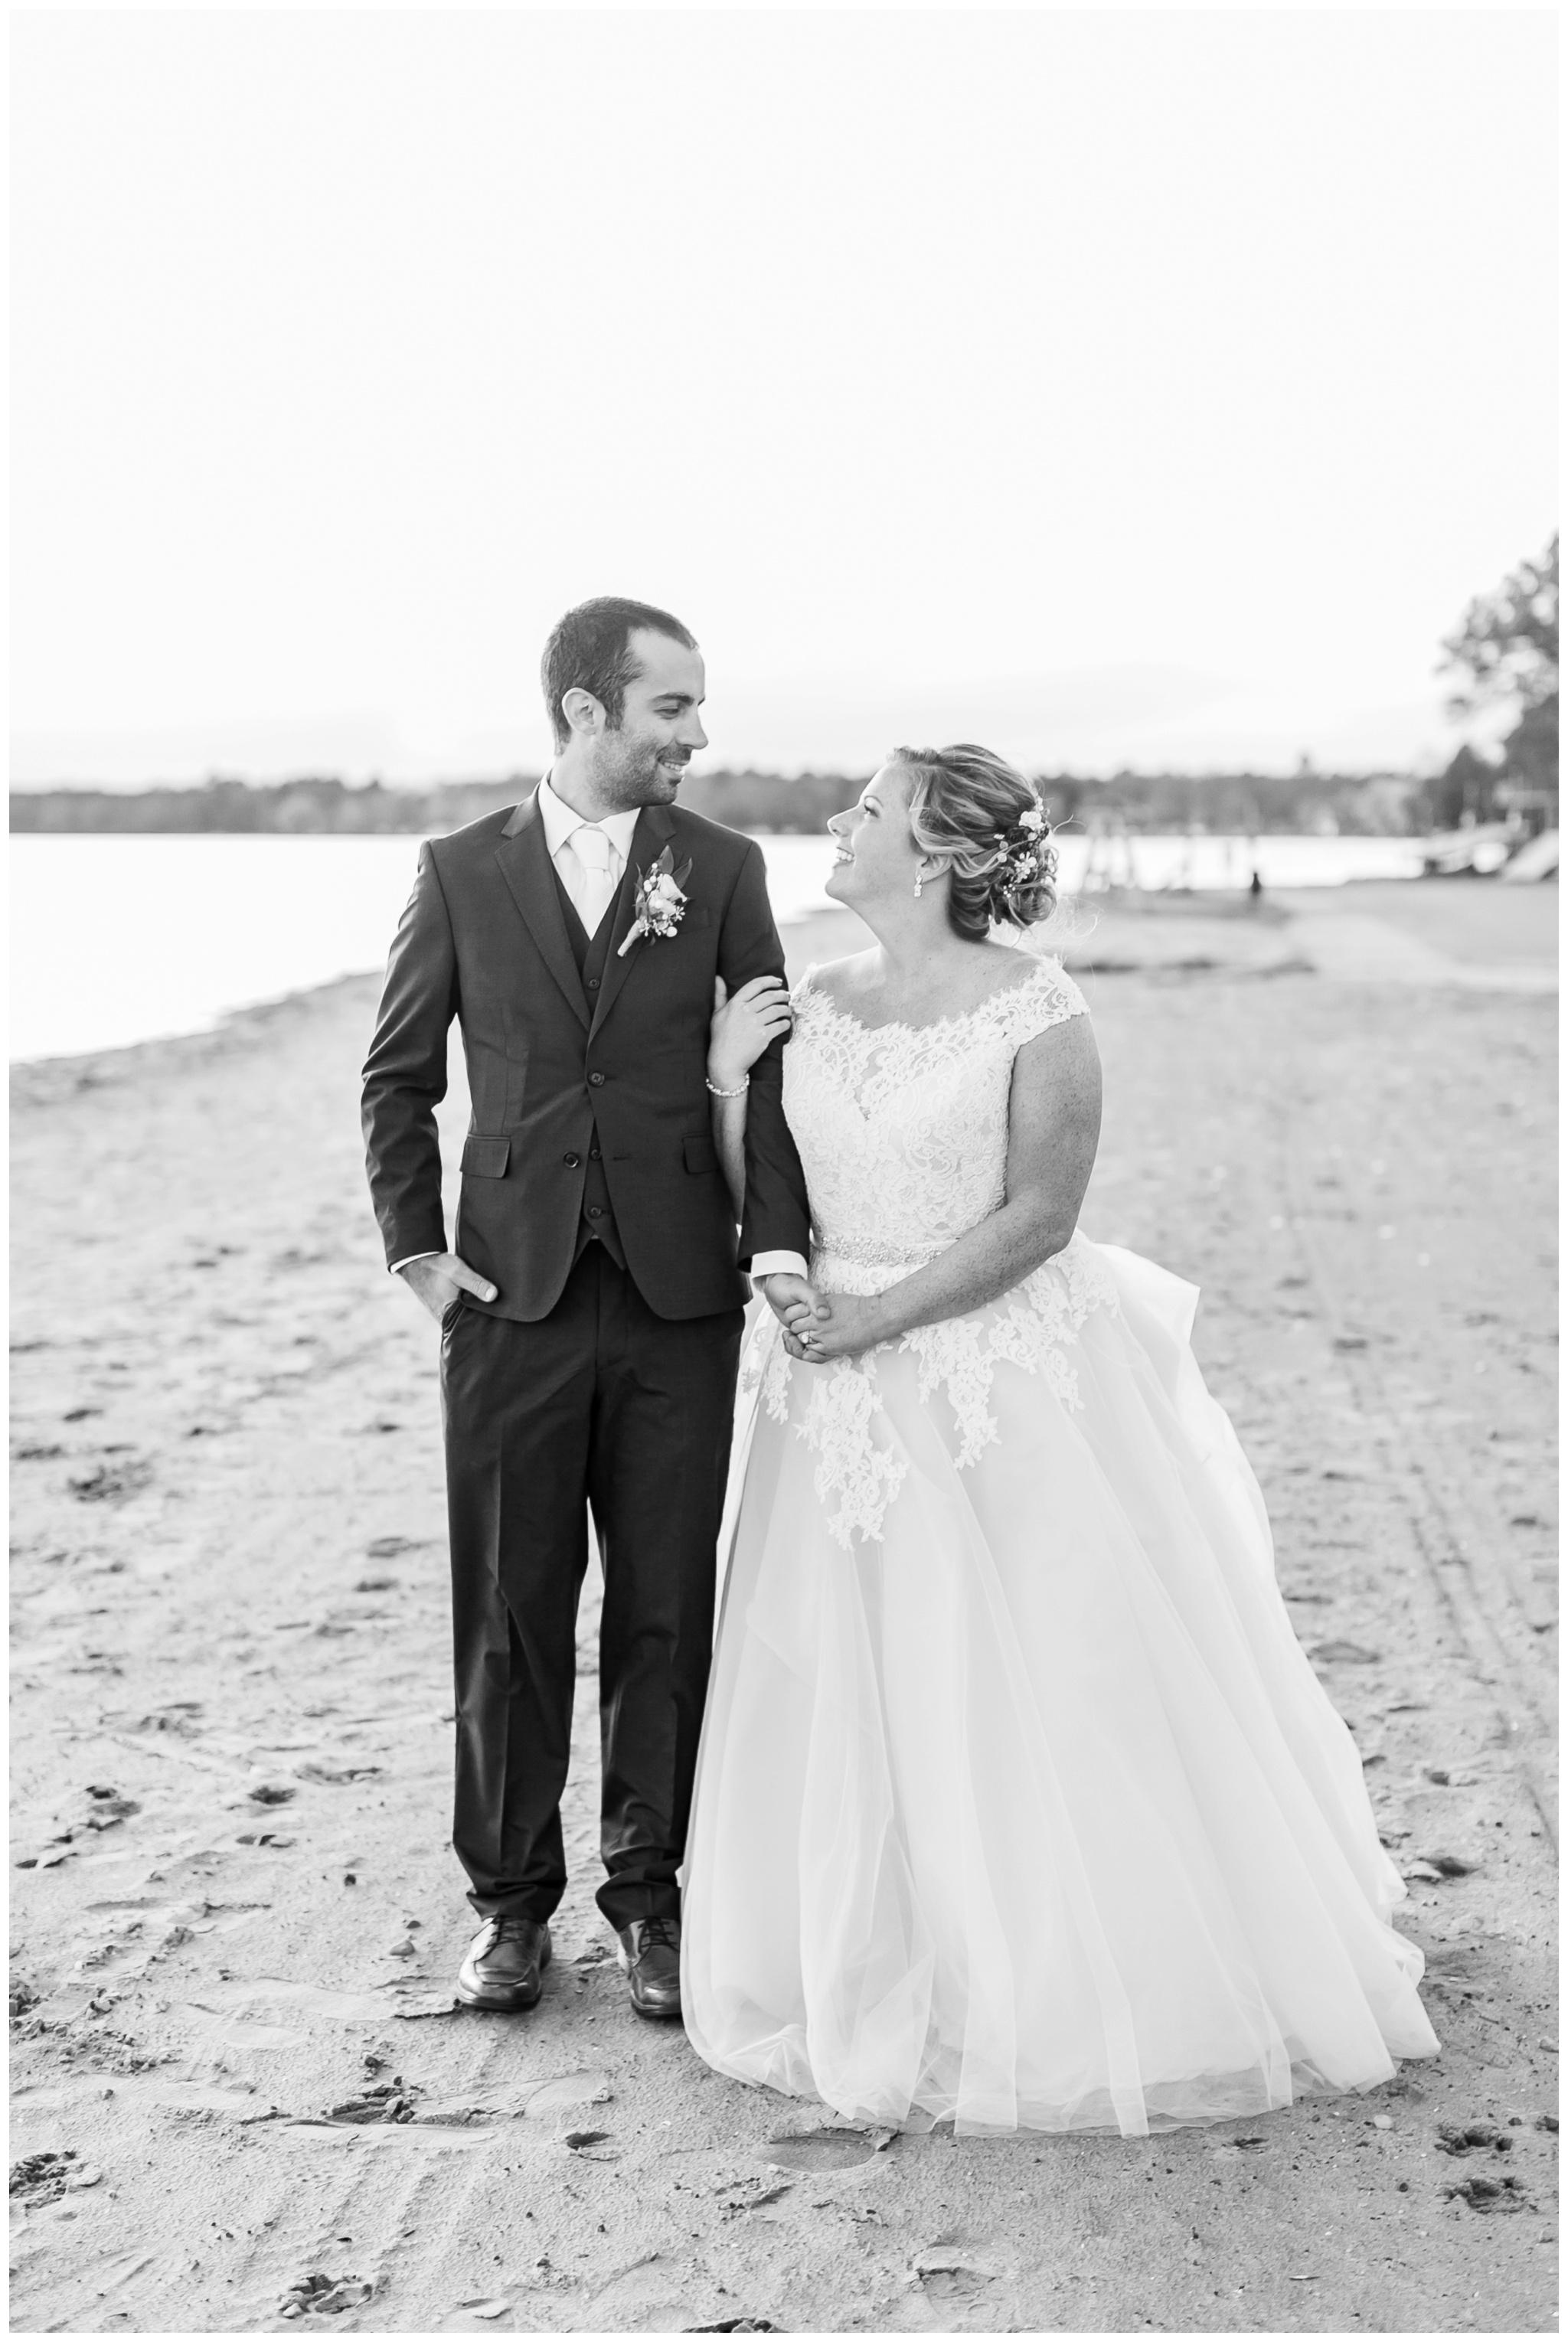 Shawano_County_park_Wedding_Caynay_Photo_Madison_Wi_2347.jpg